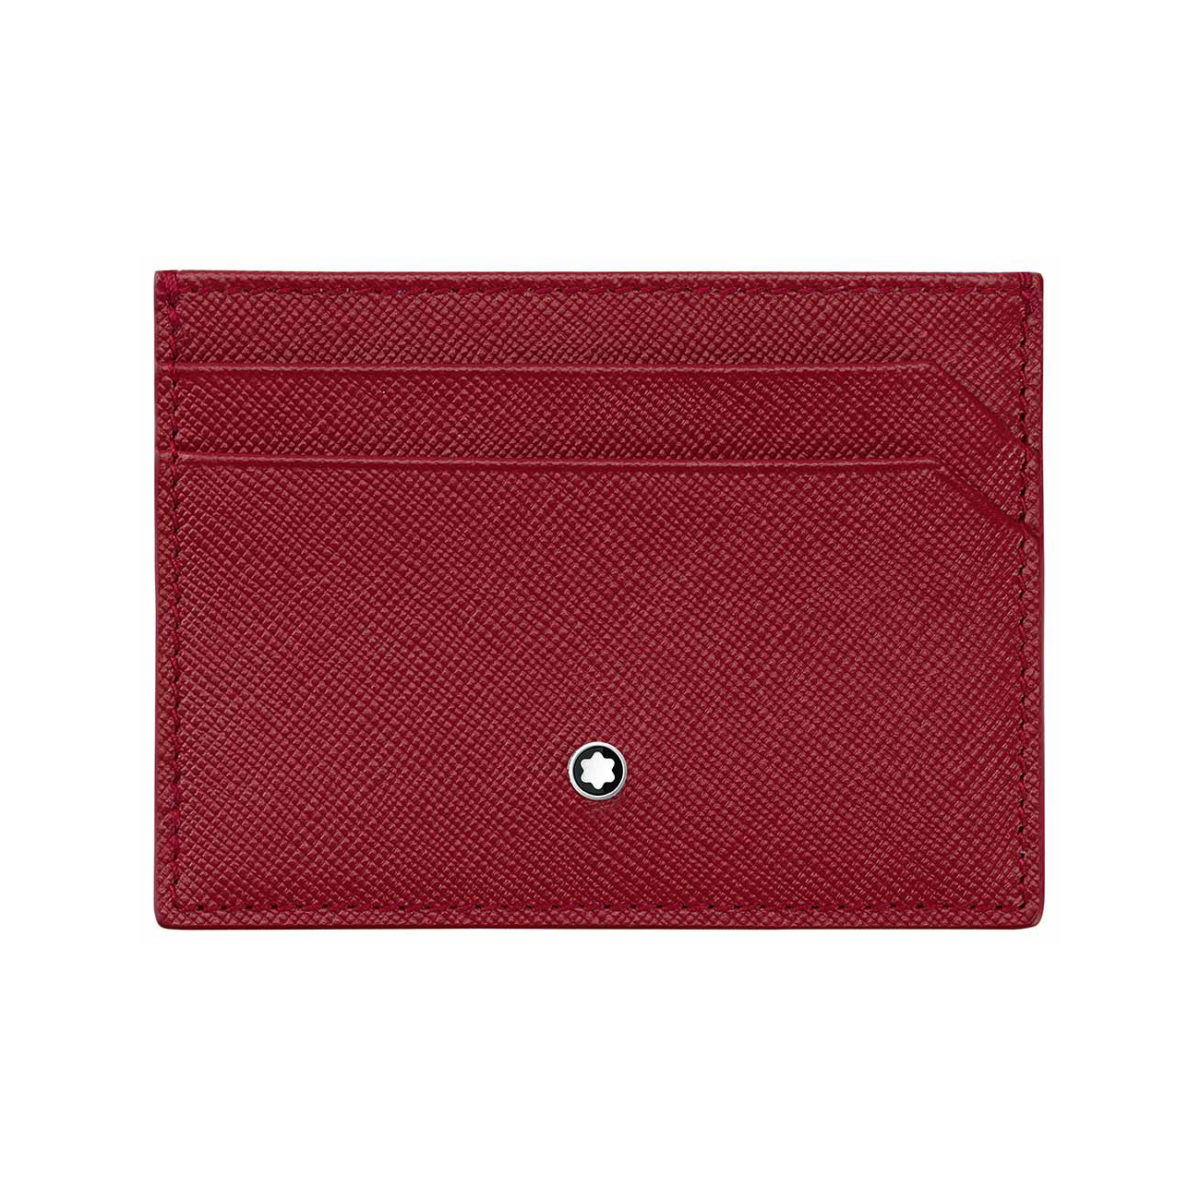 115849 — Montblanc Mb Sartorial Pocket 5Cc Red